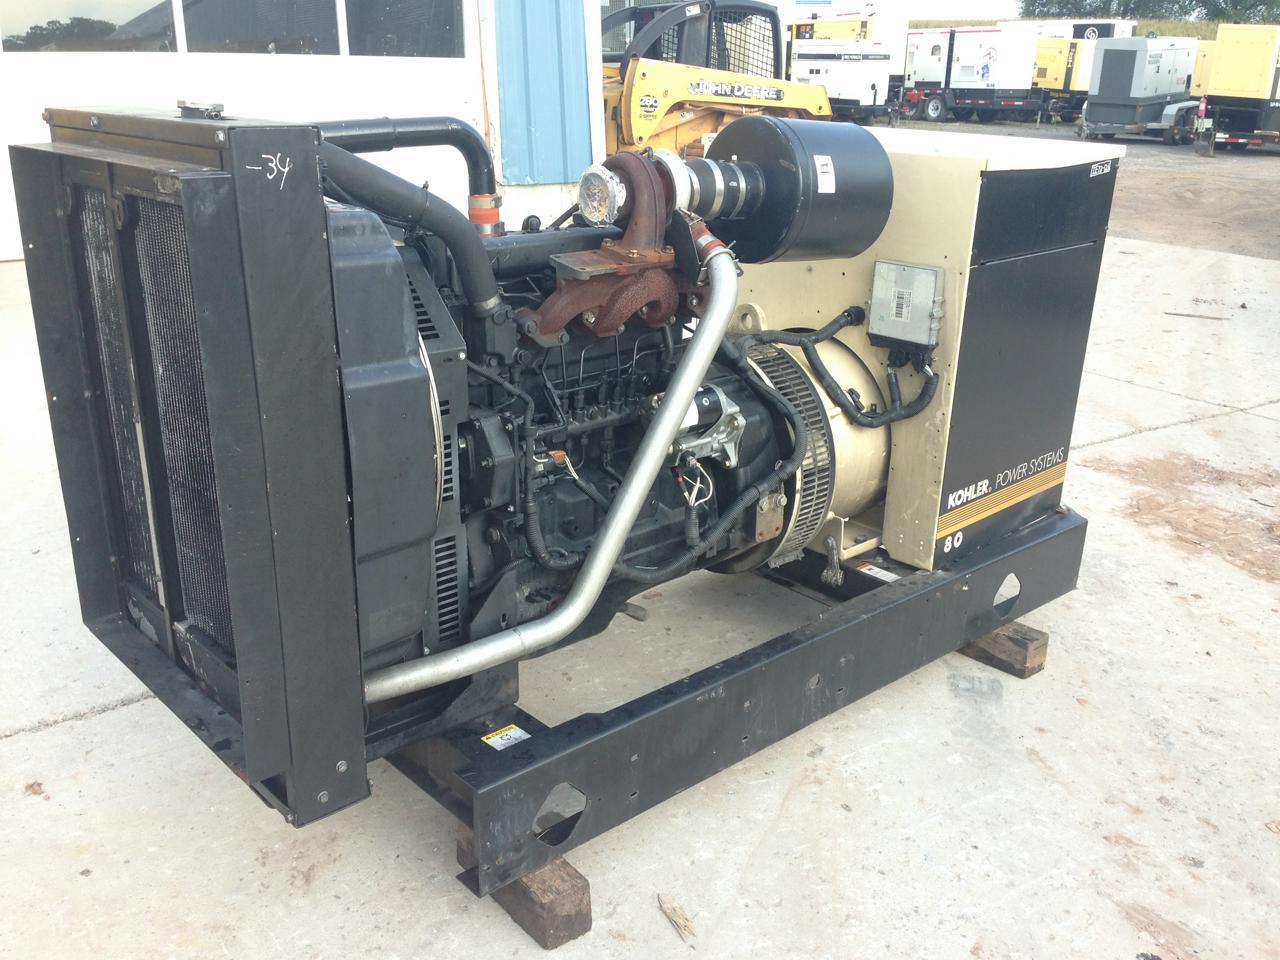 John Deere 60 Generator : Kw kohler generator set lead reconnectable john